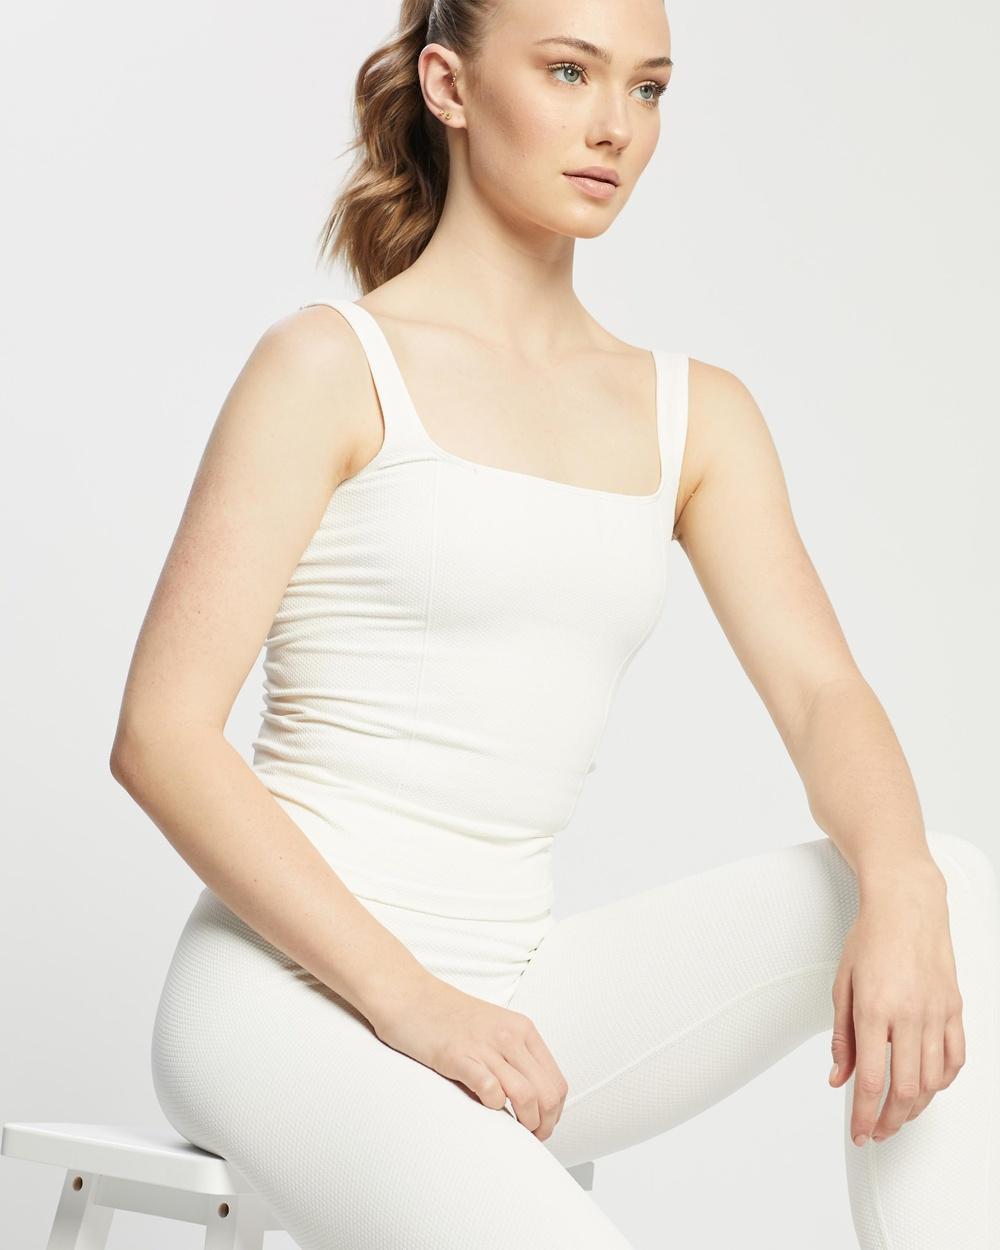 Aim'n Luxe Seamless Singlet T-Shirts & Singlets Off-White Singlets Australia